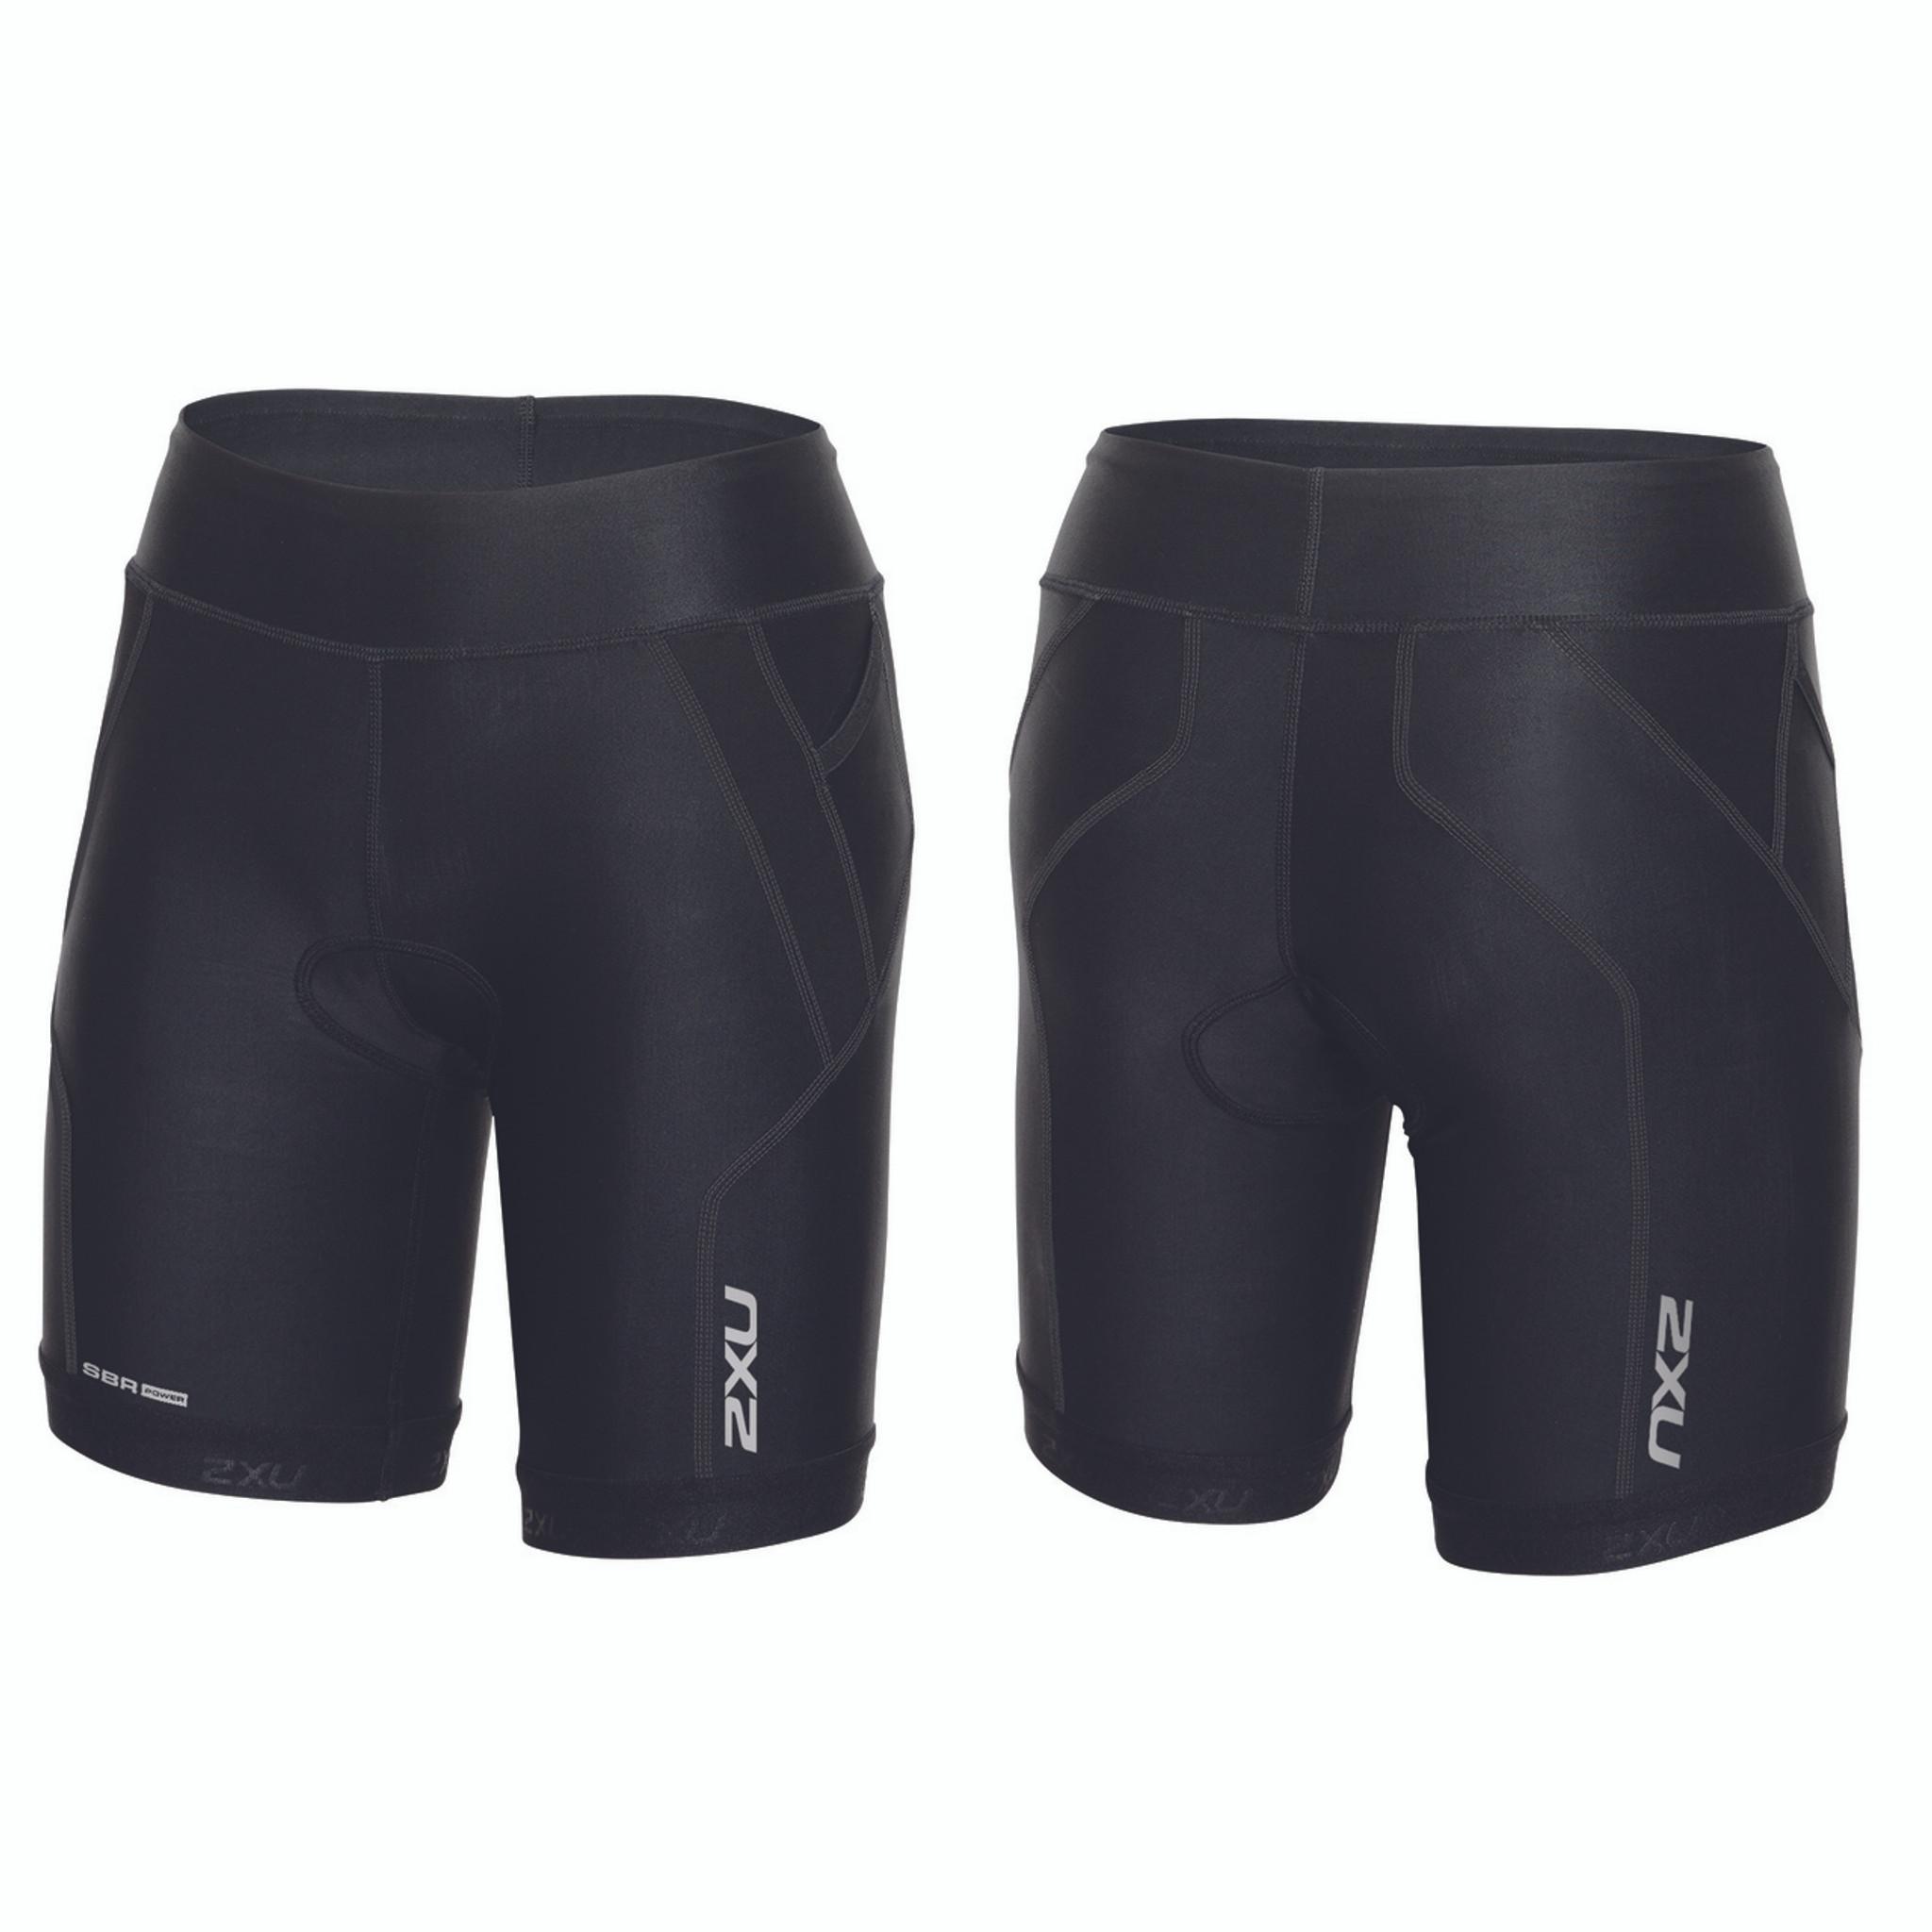 Runderwear Mens Triathlon Suit Premium Padded Performance Tri Suit with Dual Rear Pockets